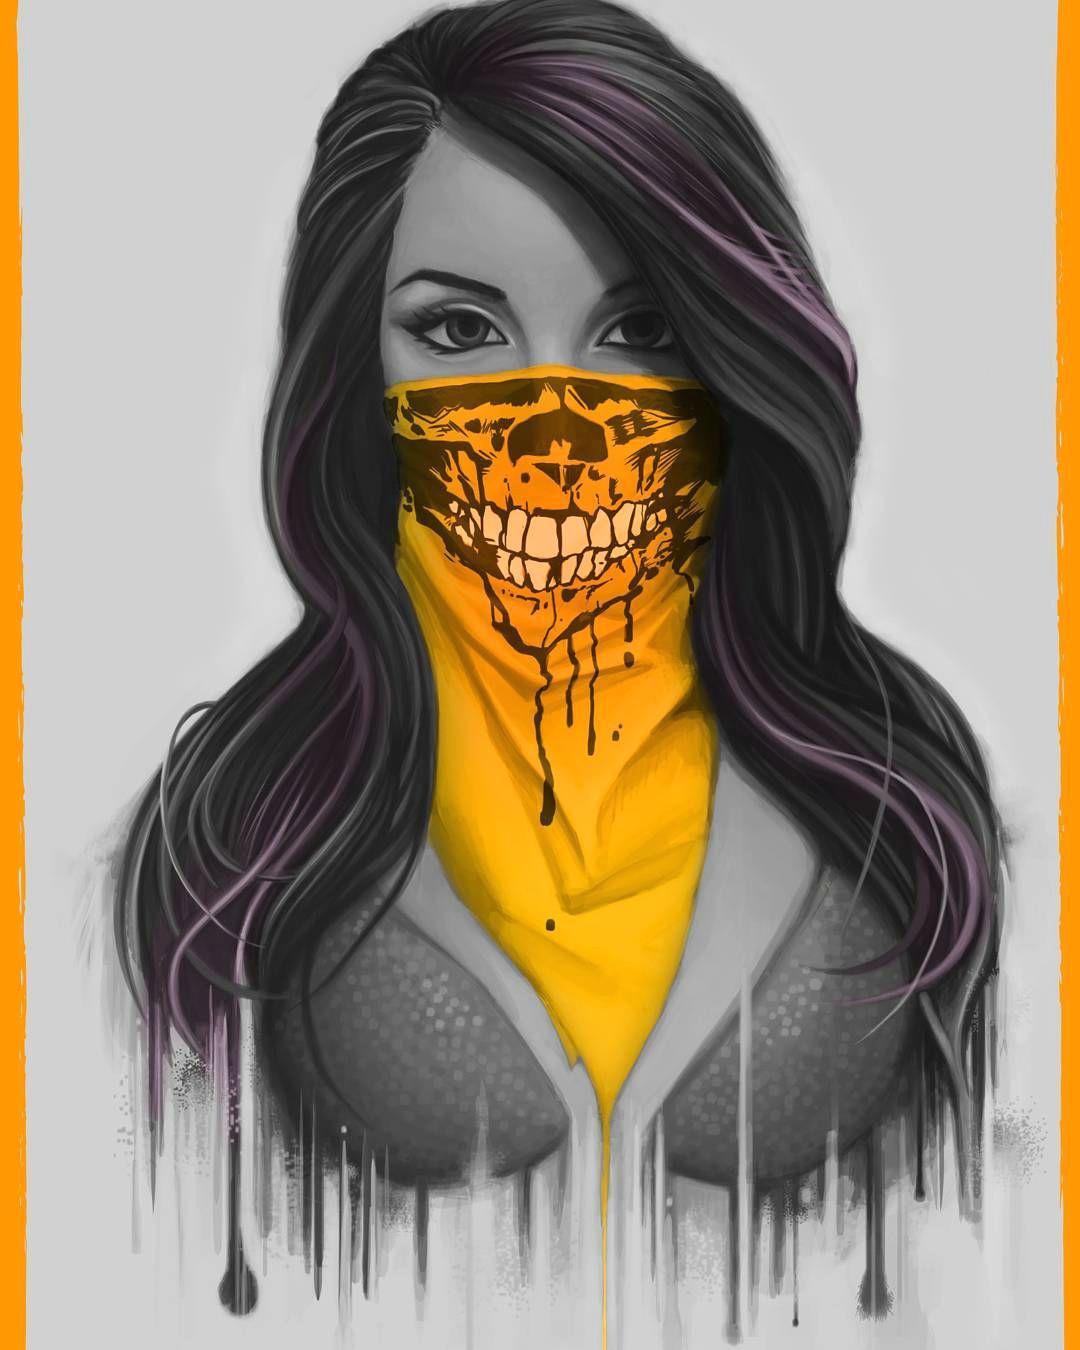 skull girlface artwork bandit mask digitalpainting art potraitart painting digital ink photoshop wacom cintiq art grey orange skeleton